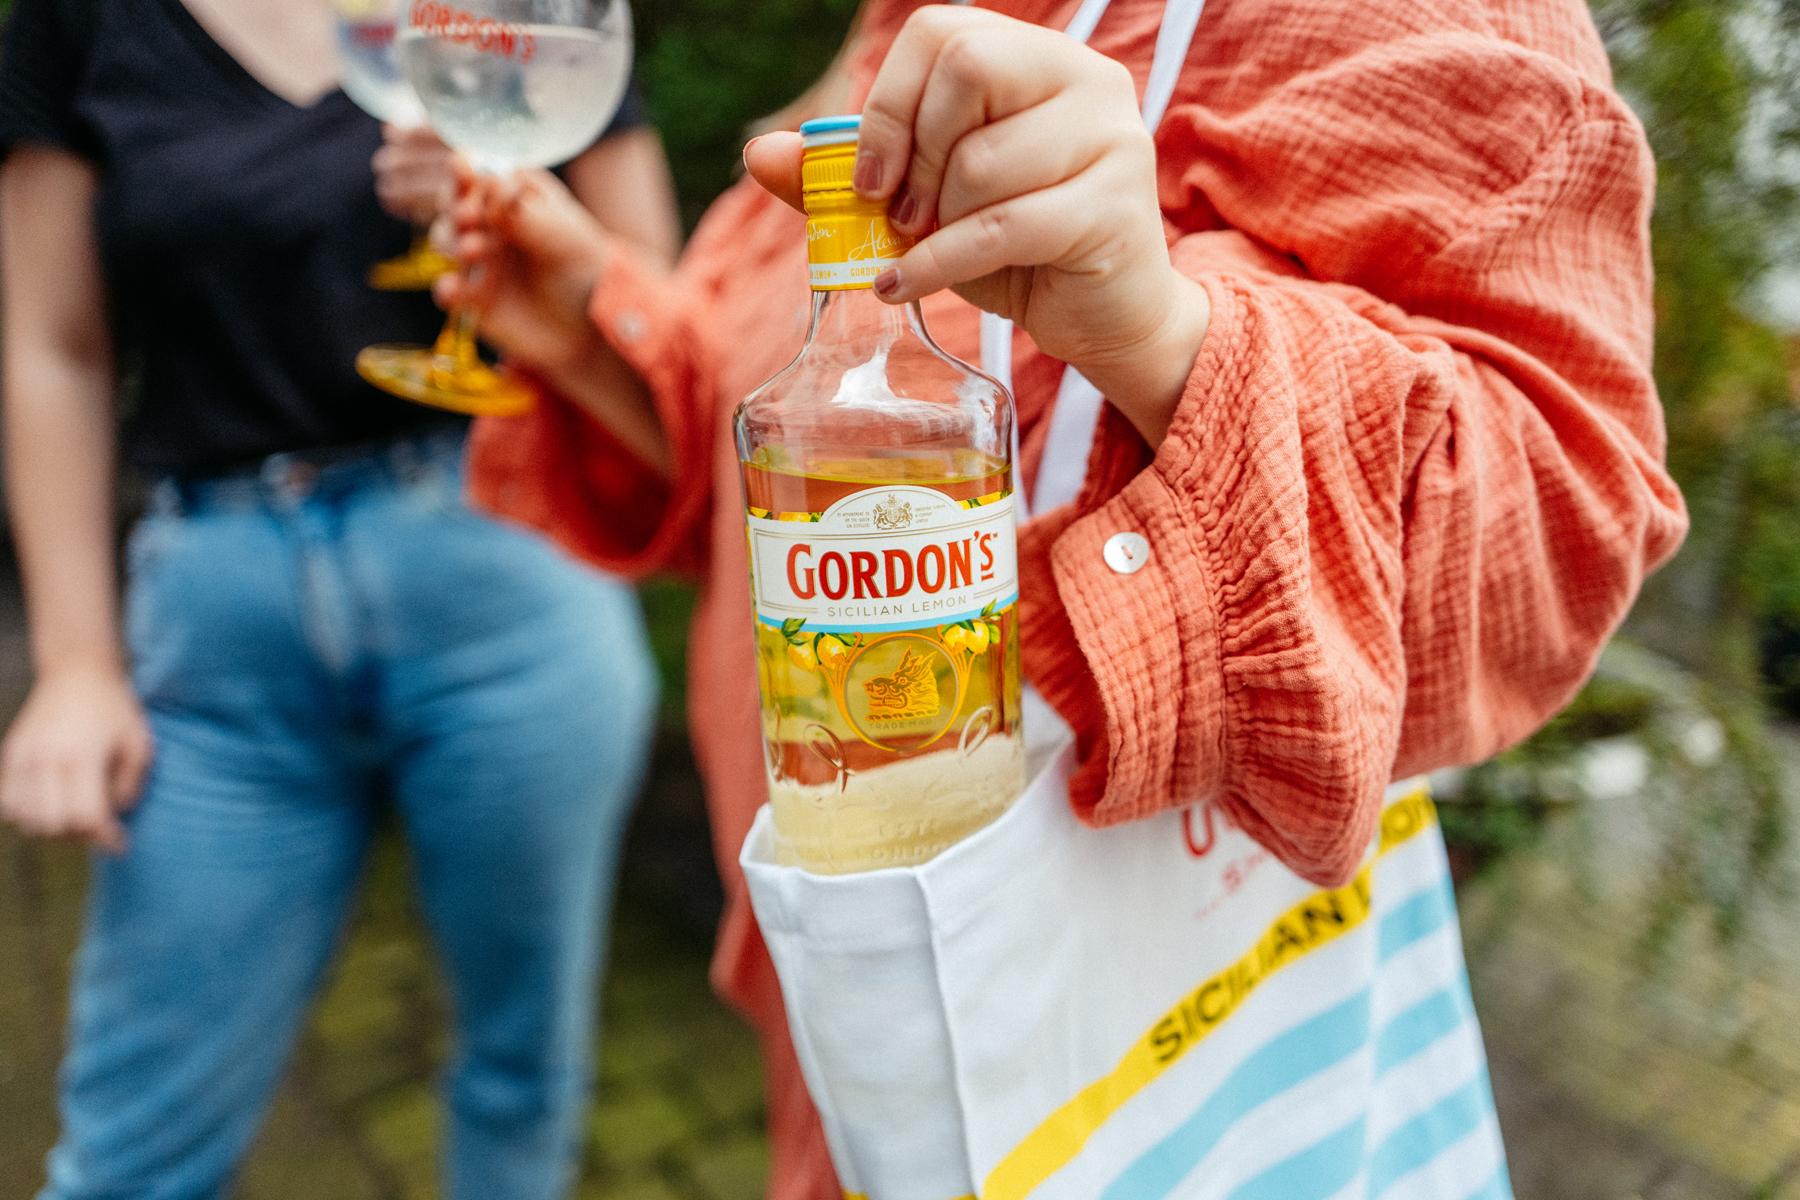 Geheimtipp Hamburg Gordons Gin Sicilian Lemon Dahlina Sophie Kock 052